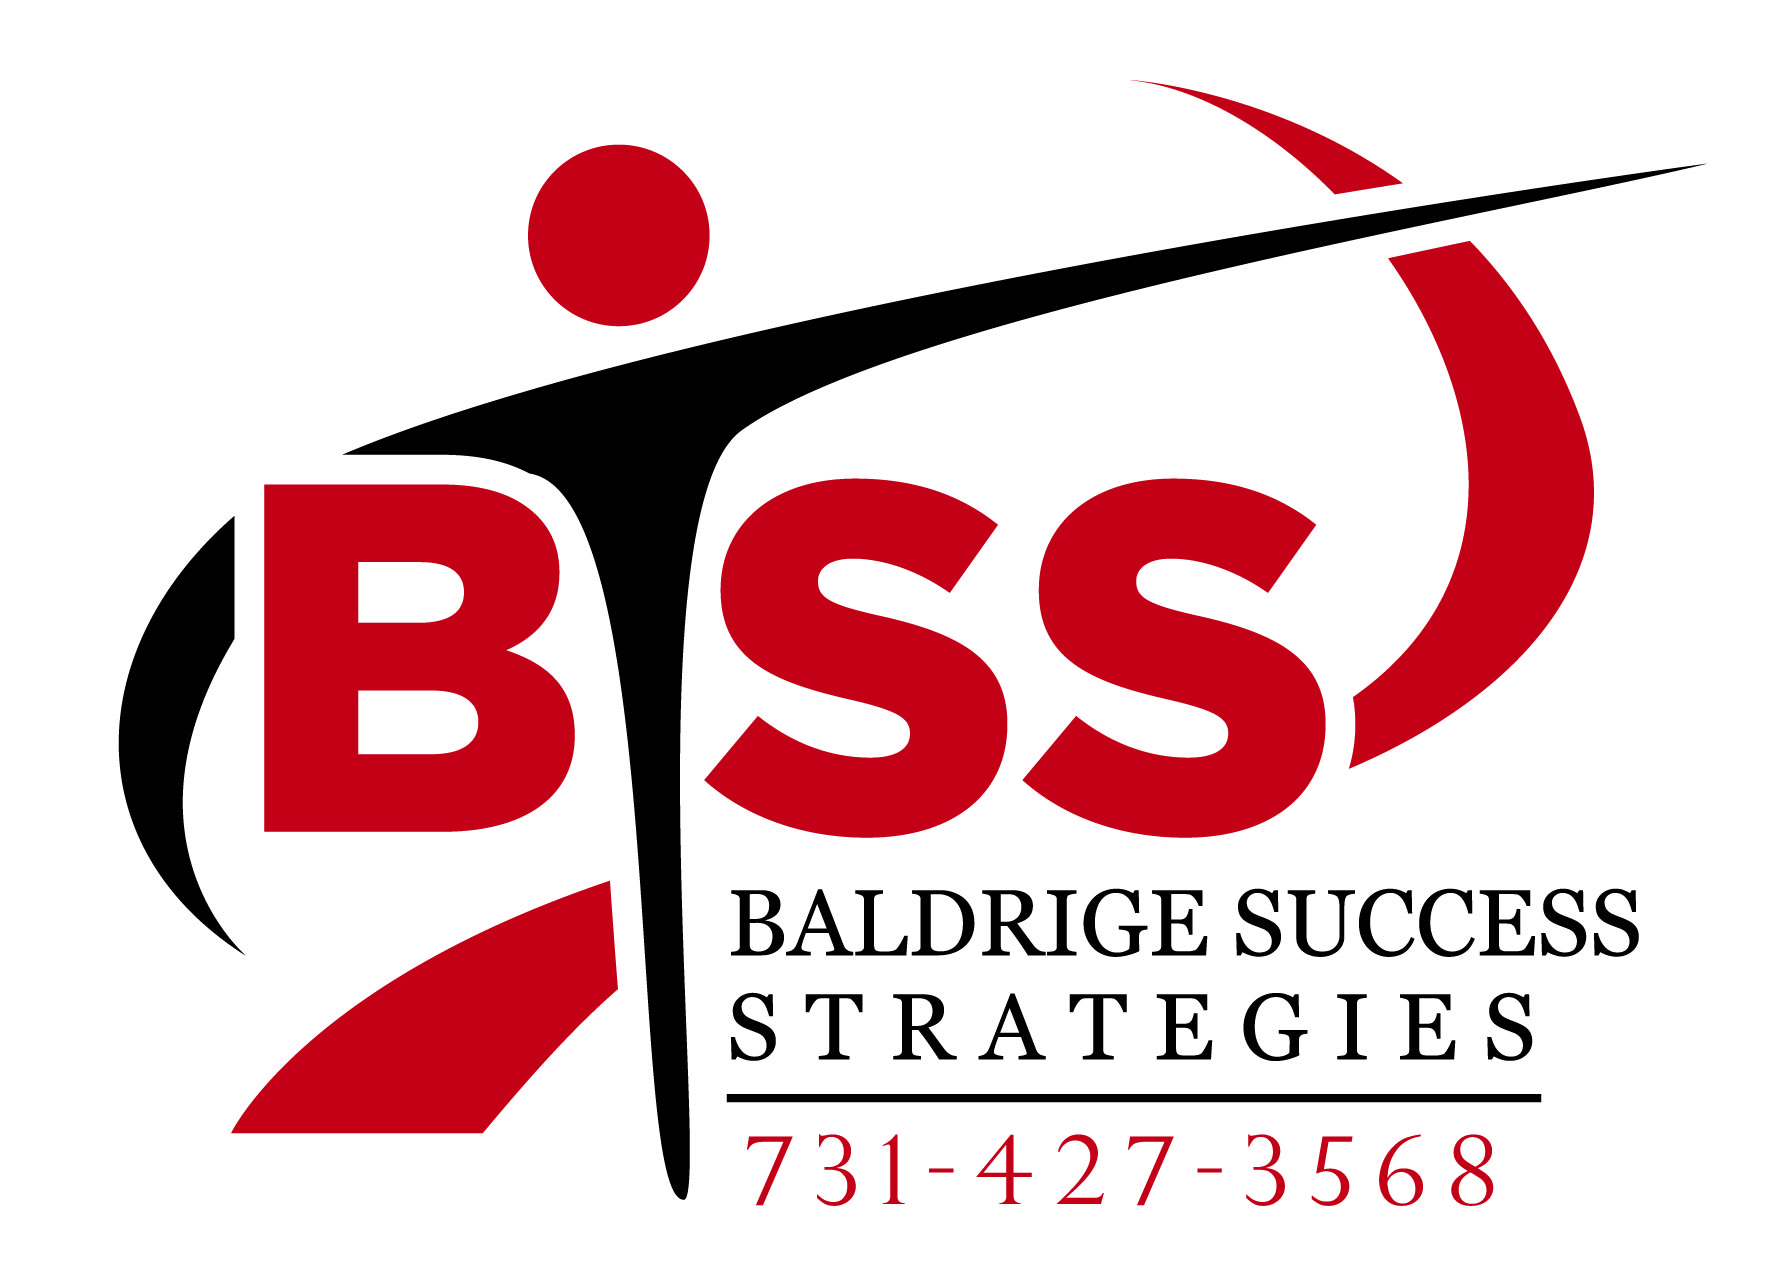 Baldrige Success Strategies